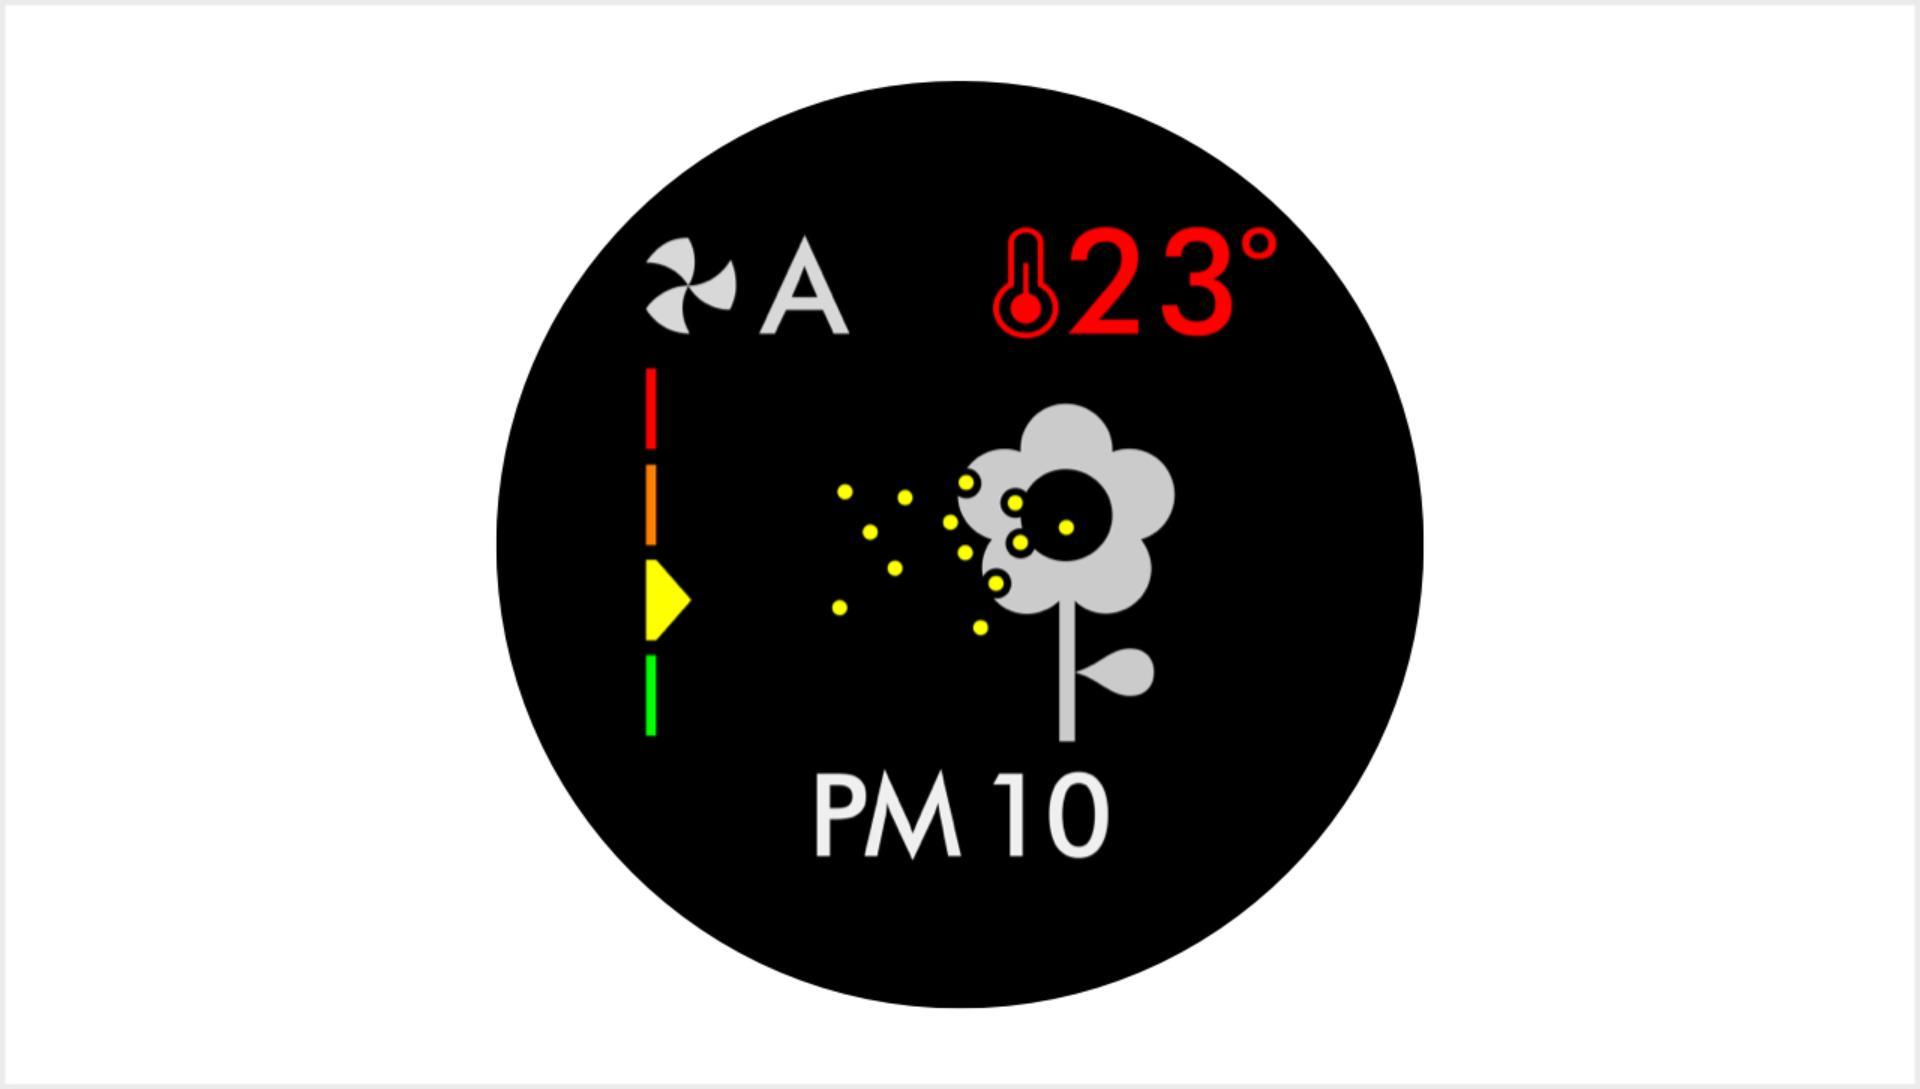 Particulate matter PM10 screen